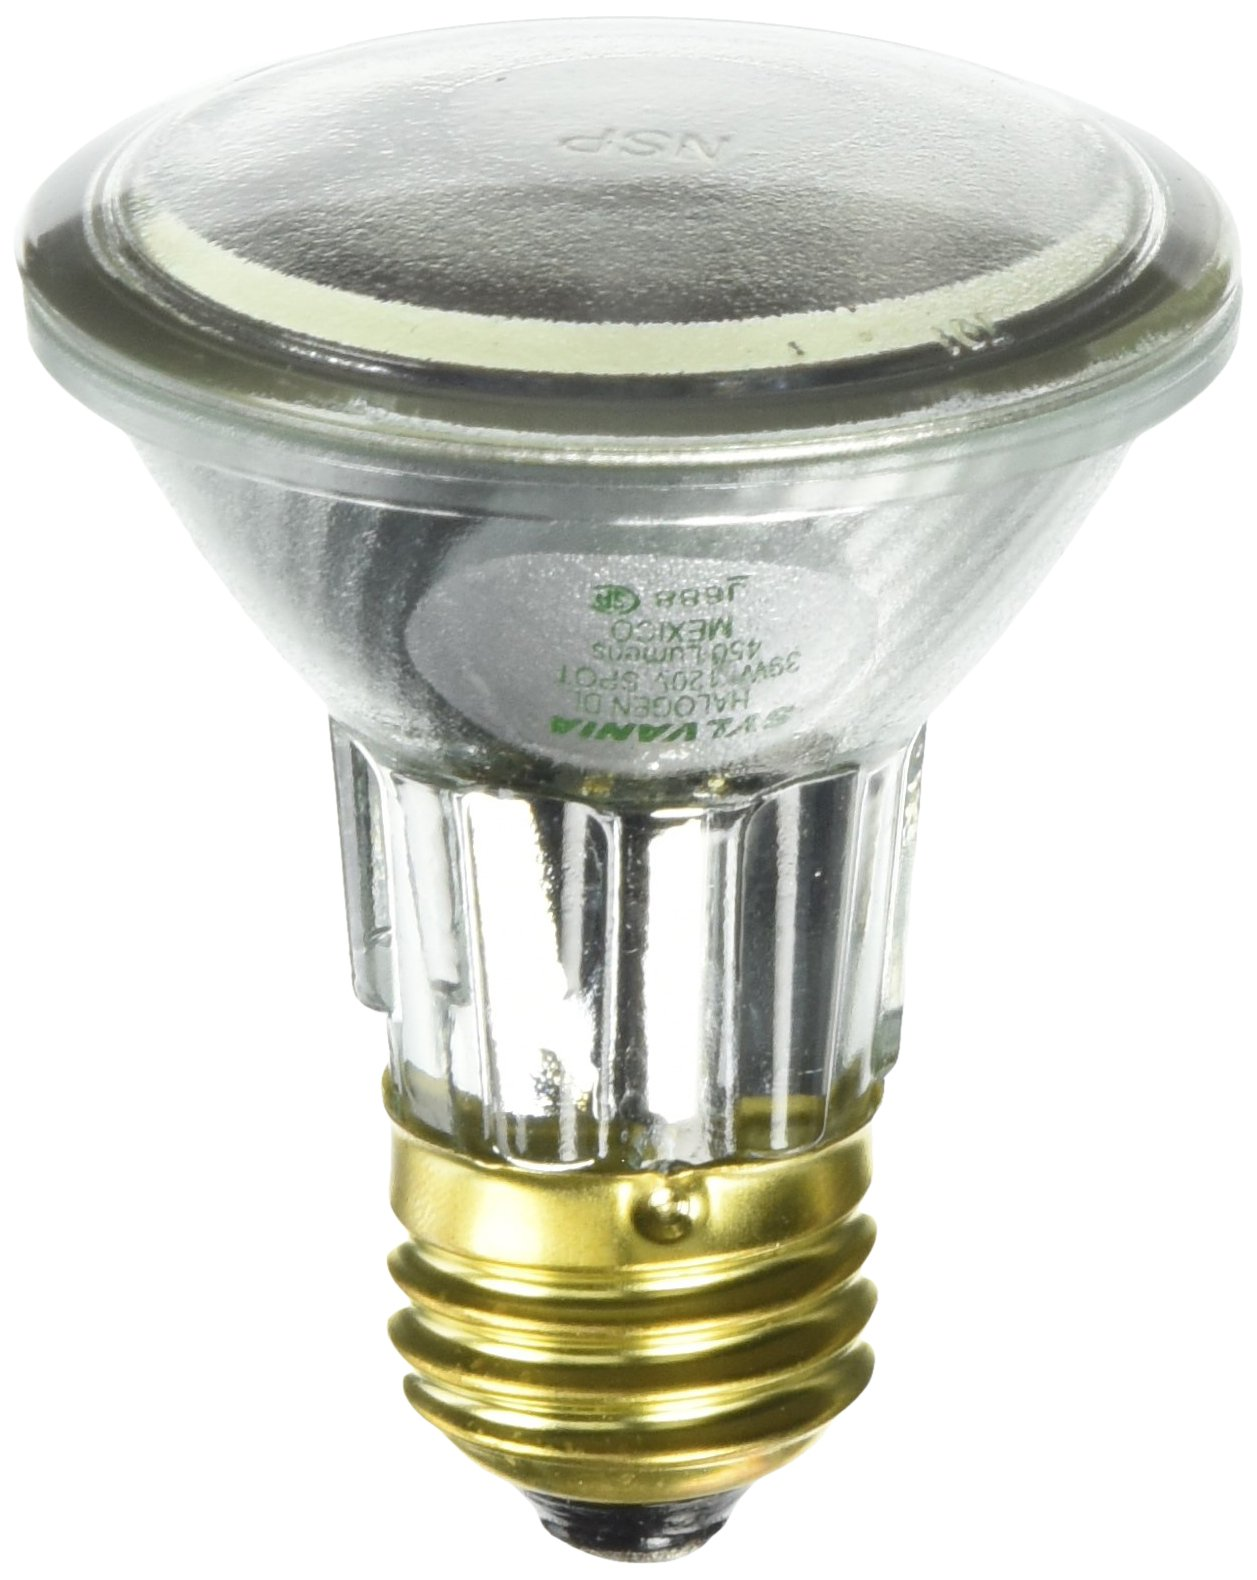 Sylvania 16110 - 39PAR20/HAL/SP10/DL PAR20 Halogen Light Bulb by Sylvania